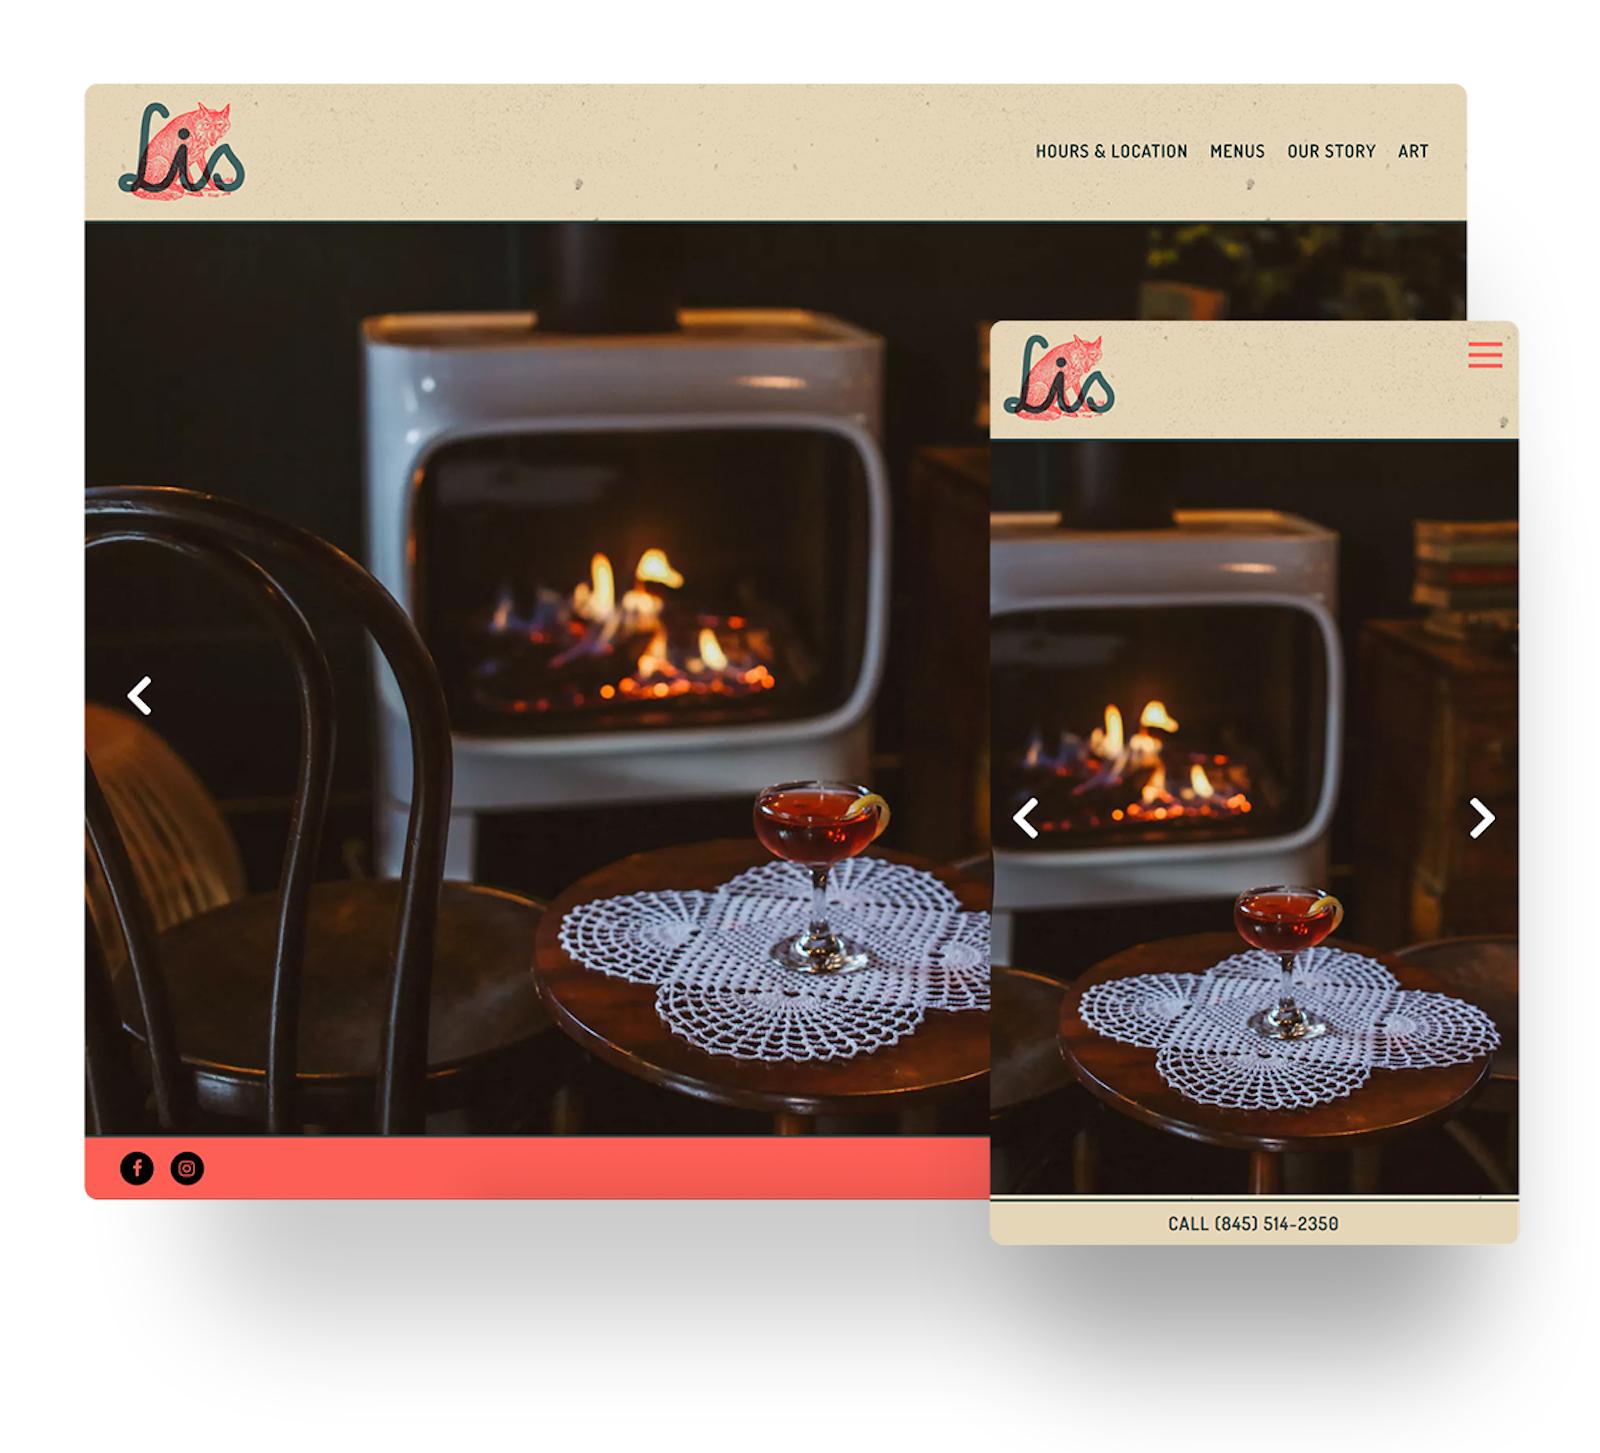 Lis Bar website in mobile and desktop views